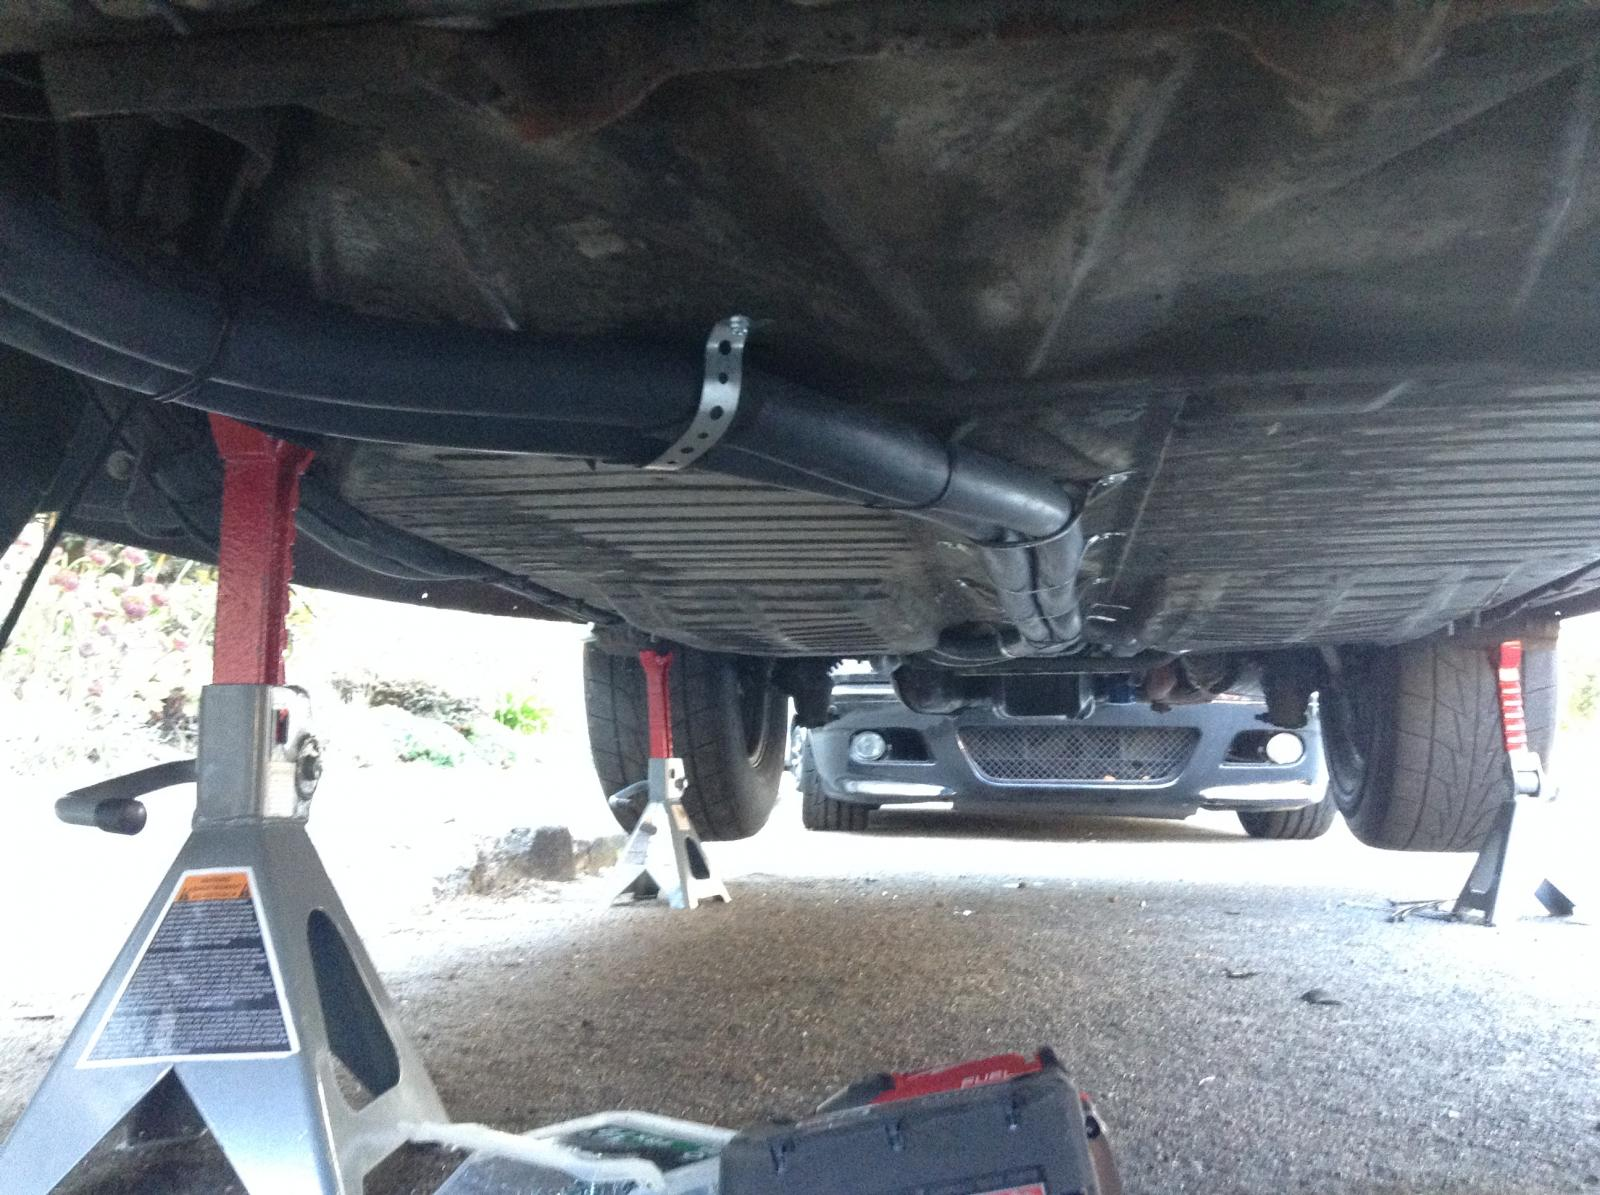 Subaru swap info/guide (sorta reposting) - Shoptalkforums com